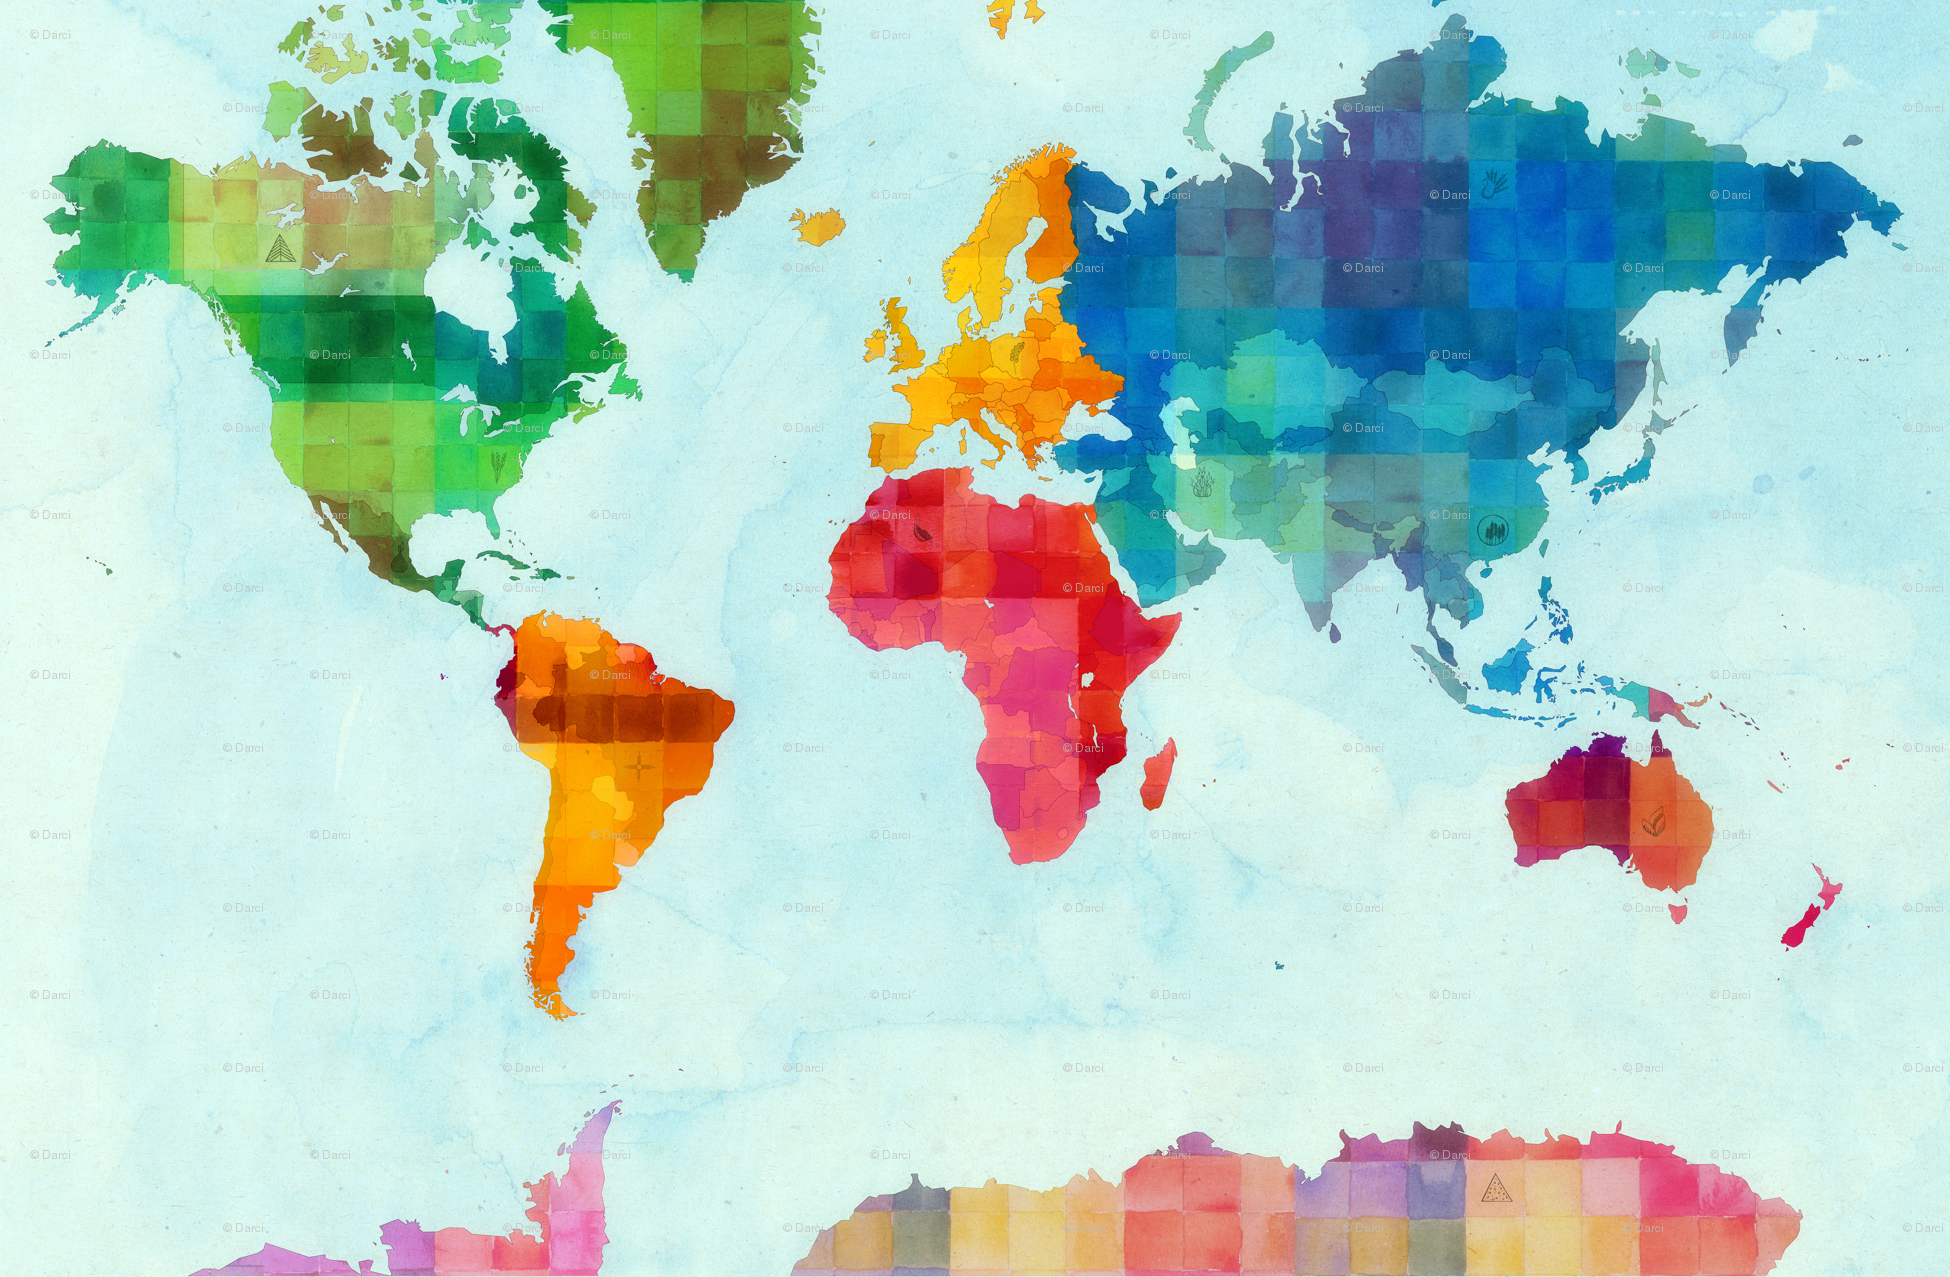 Colorful World Map Wallpaper World map 1 yard 1950x1277